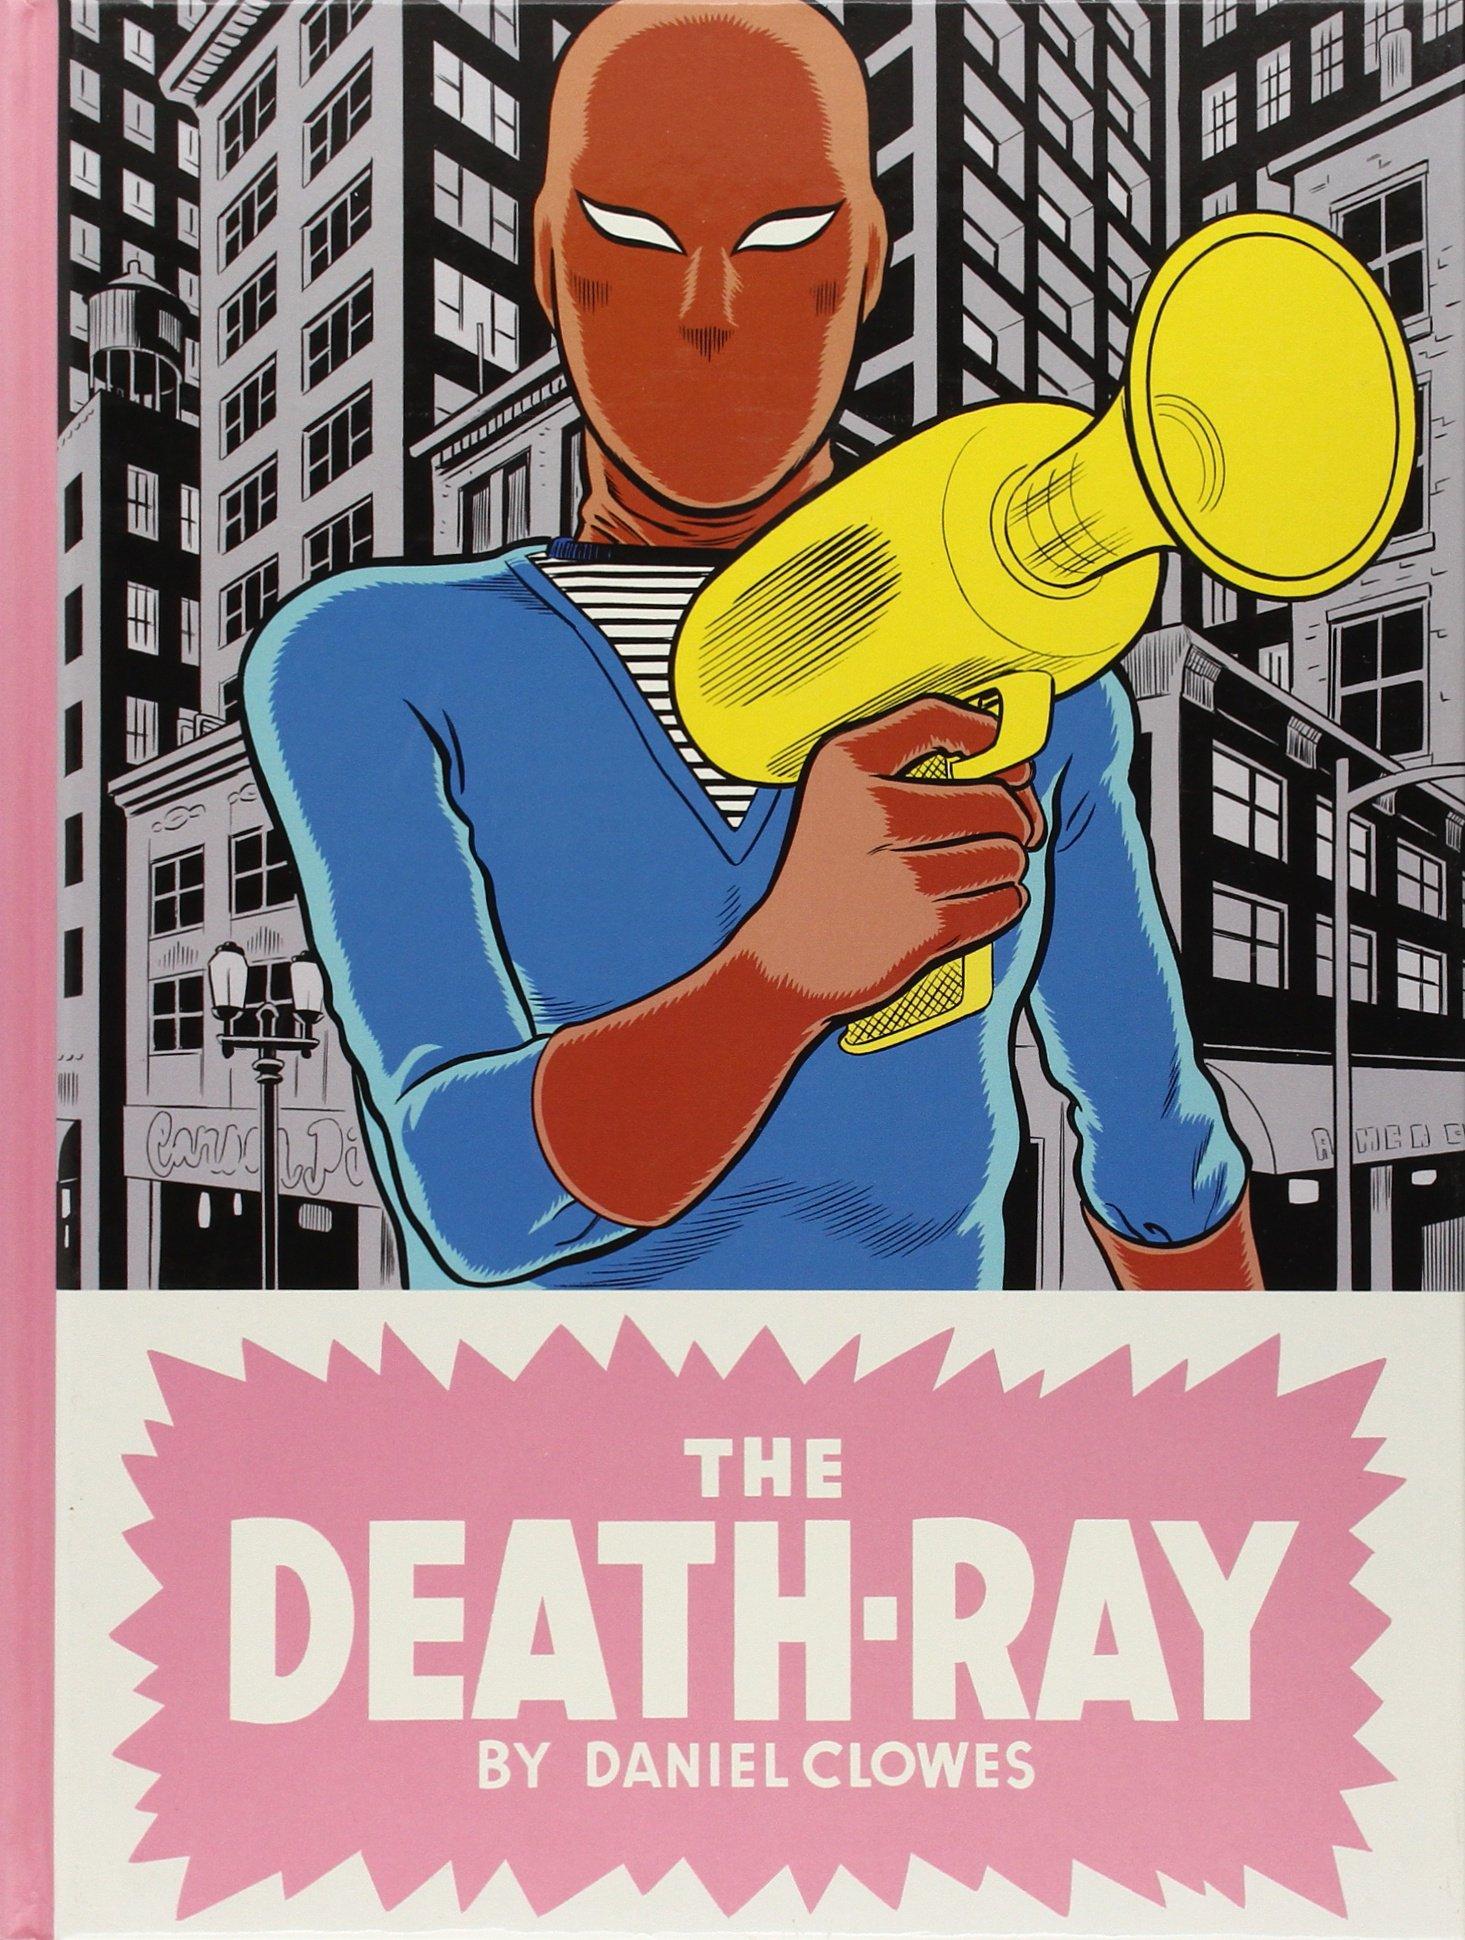 The Death-Ray: Clowes, Daniel: 9781770460515: Amazon.com: Books